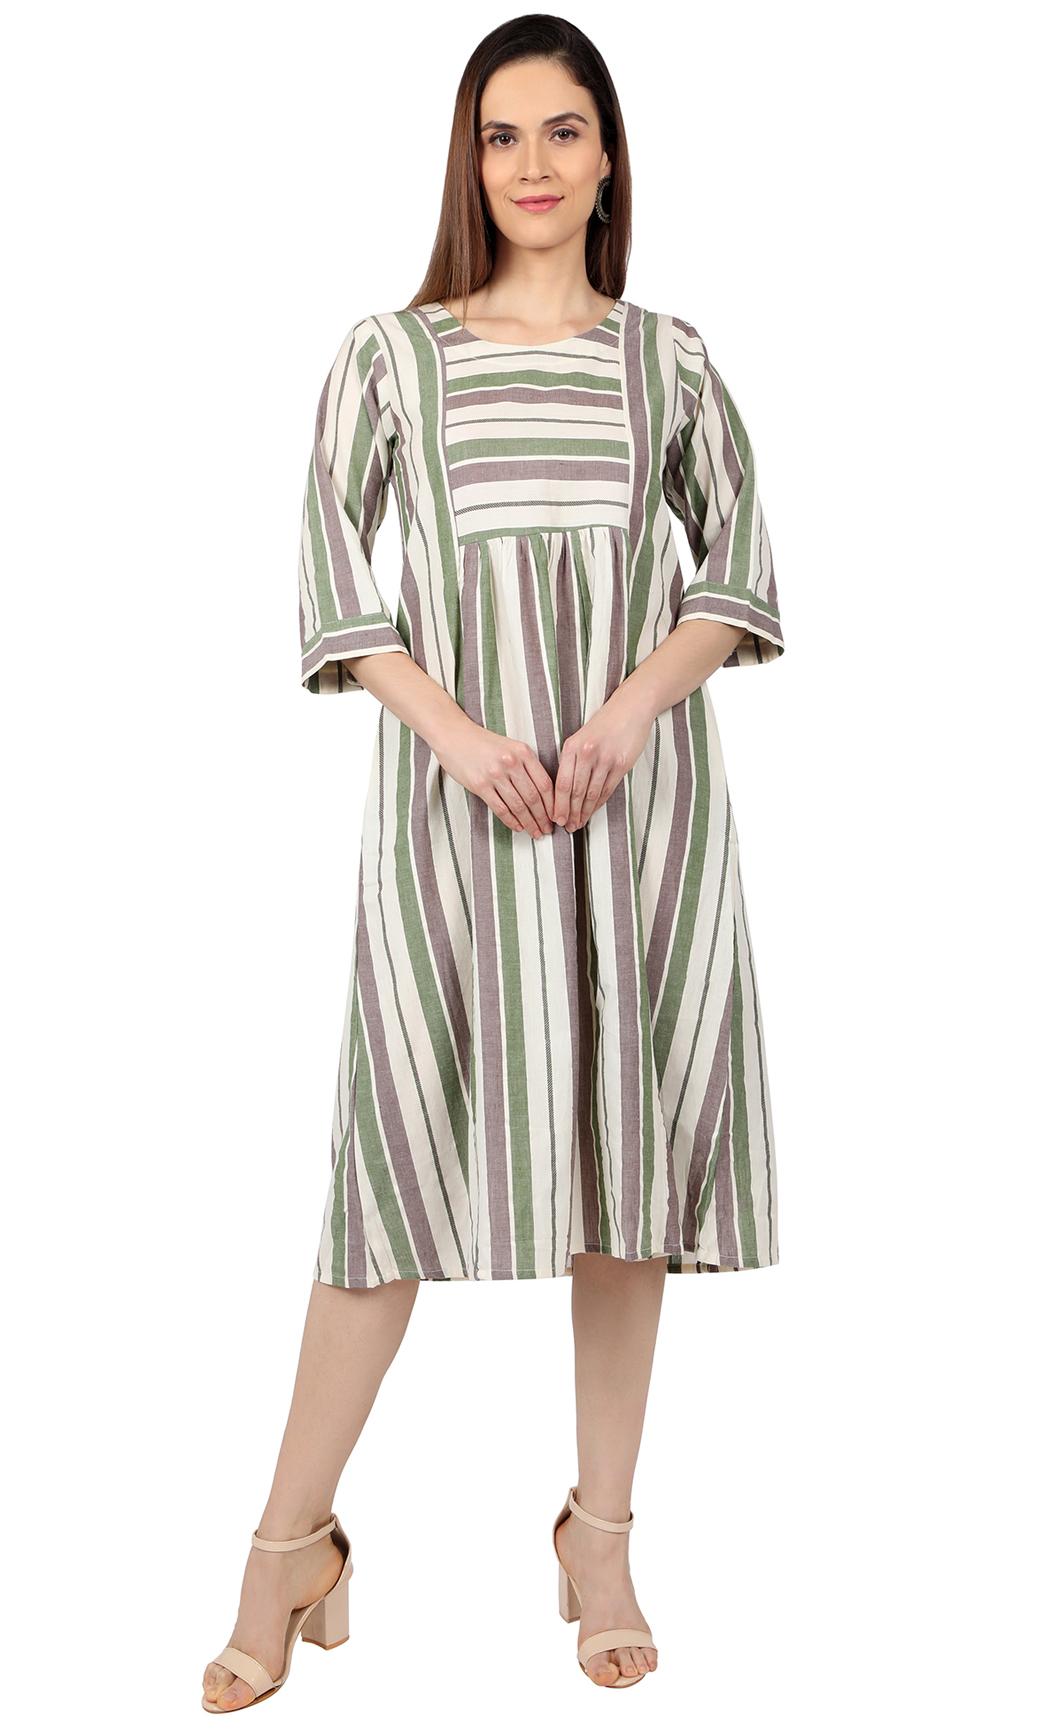 Beige and Olive Dress. Buy Online